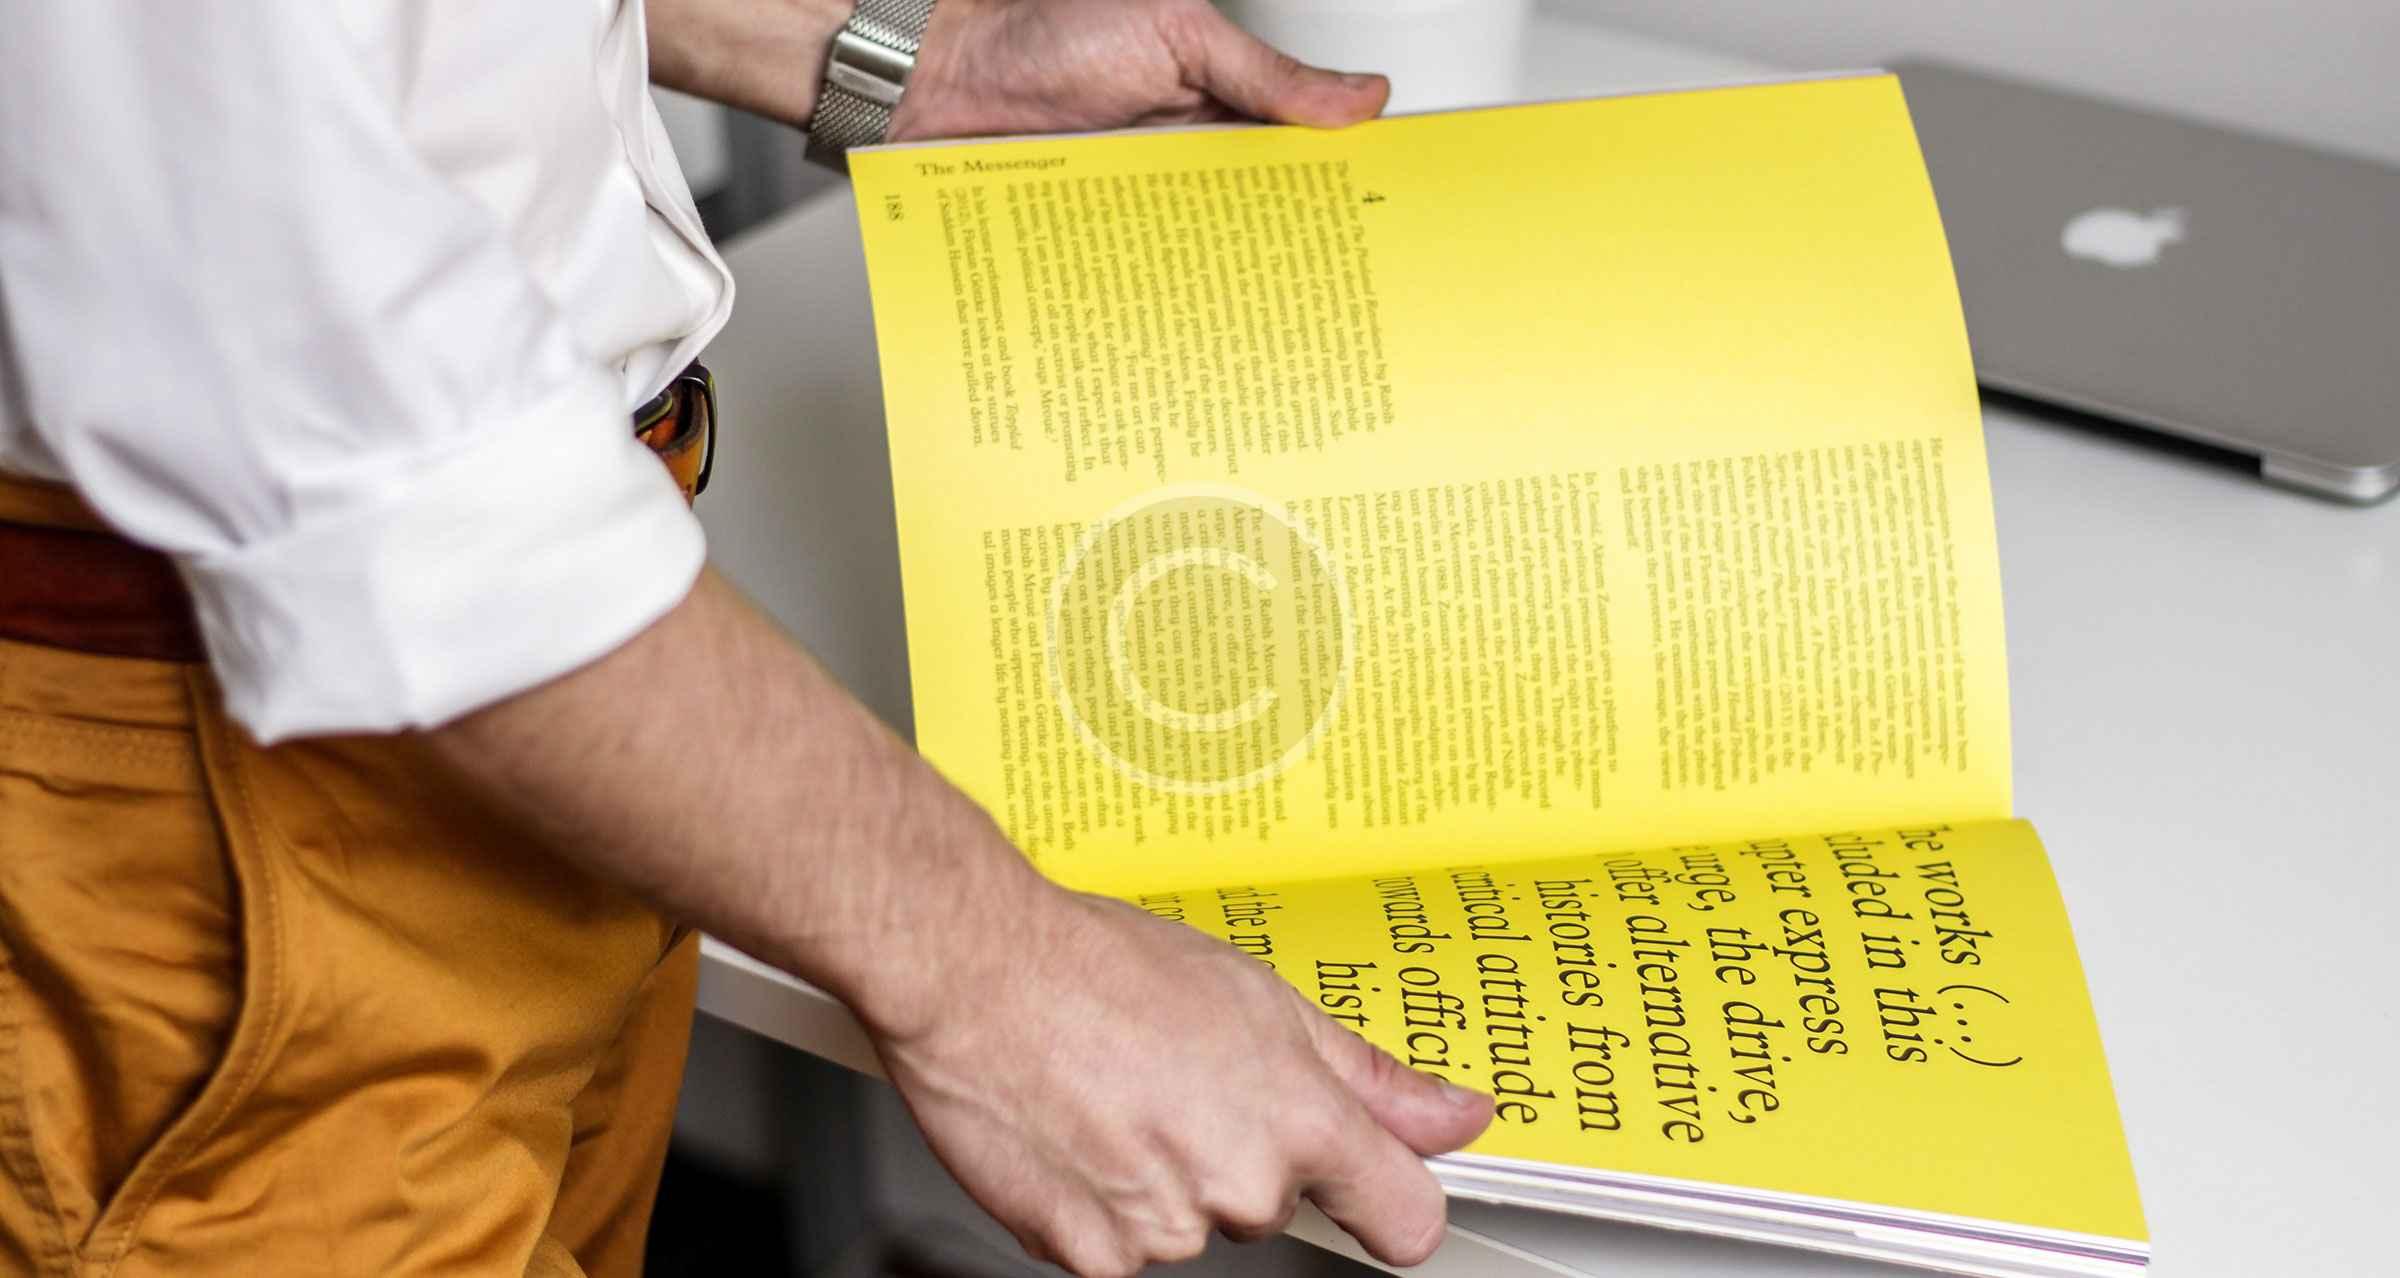 Print design trends in 2017